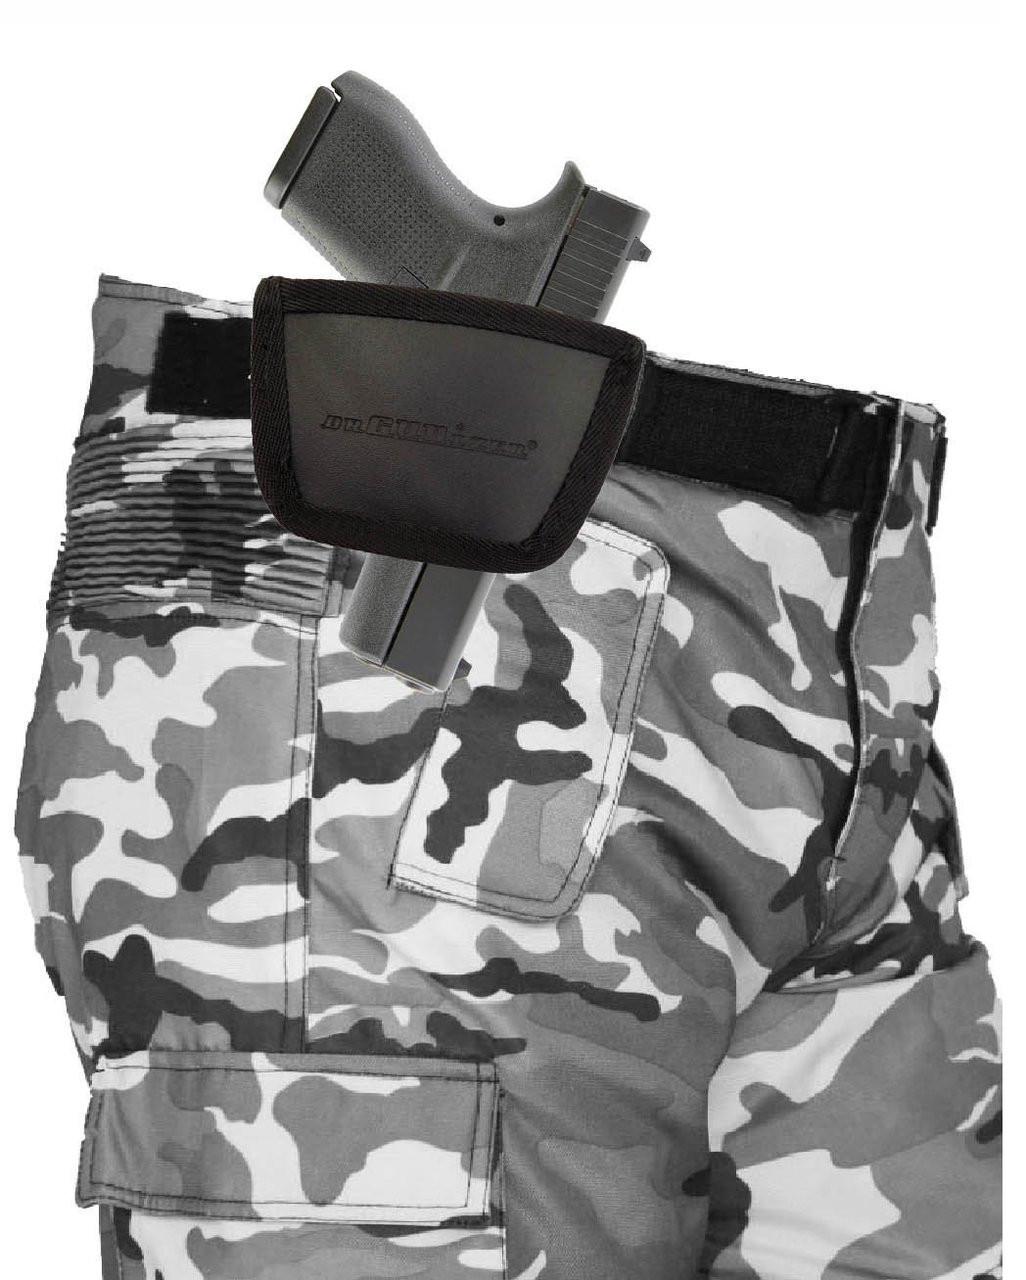 Garrison Grip Leather Inside and Outside Waistband Easy Slide Holster Fits Glock 42 (SAF)